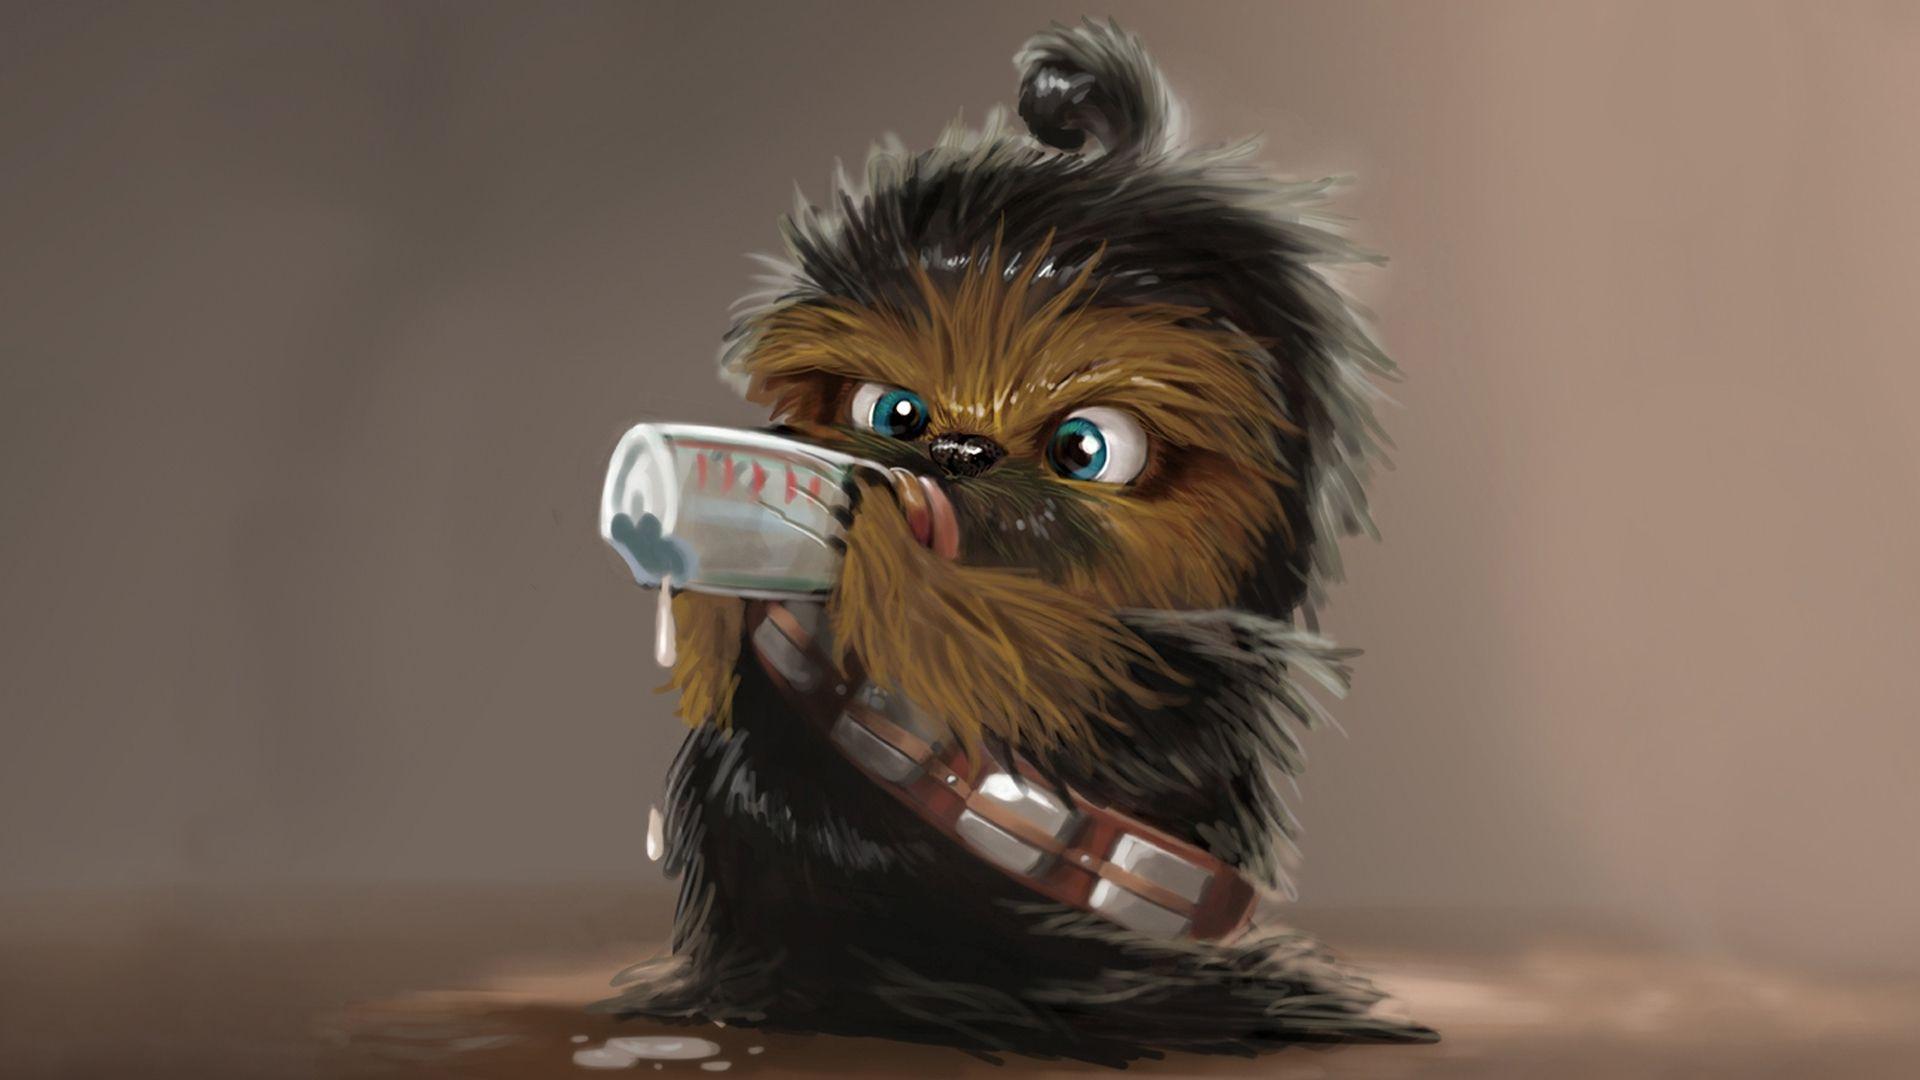 Chewbacca full hd wallpaper download